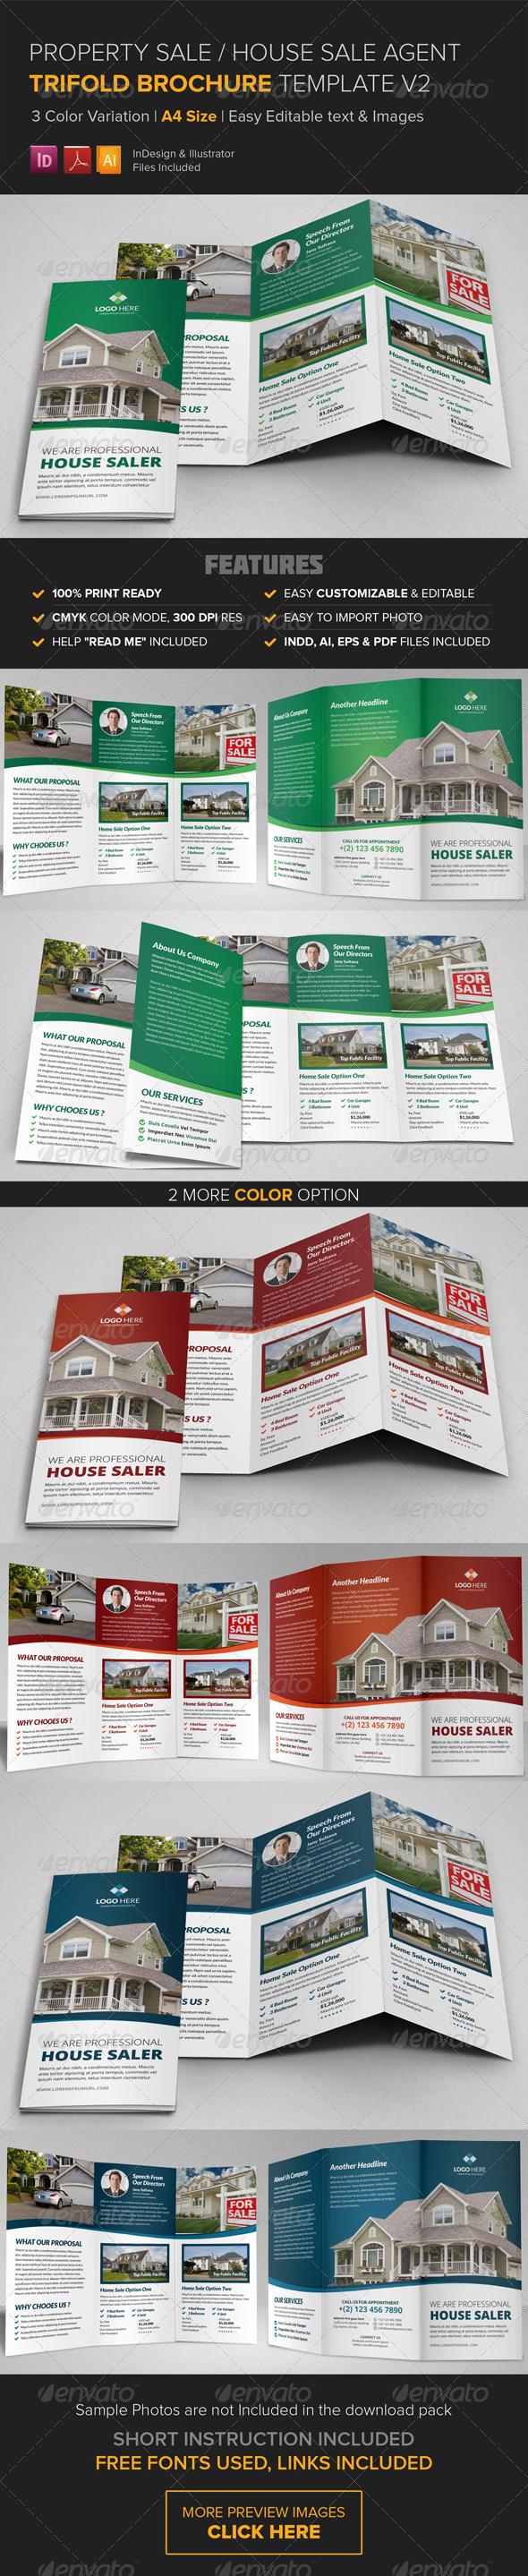 GraphicRiver Property Sale Trifold Brochure Template v2 8545969